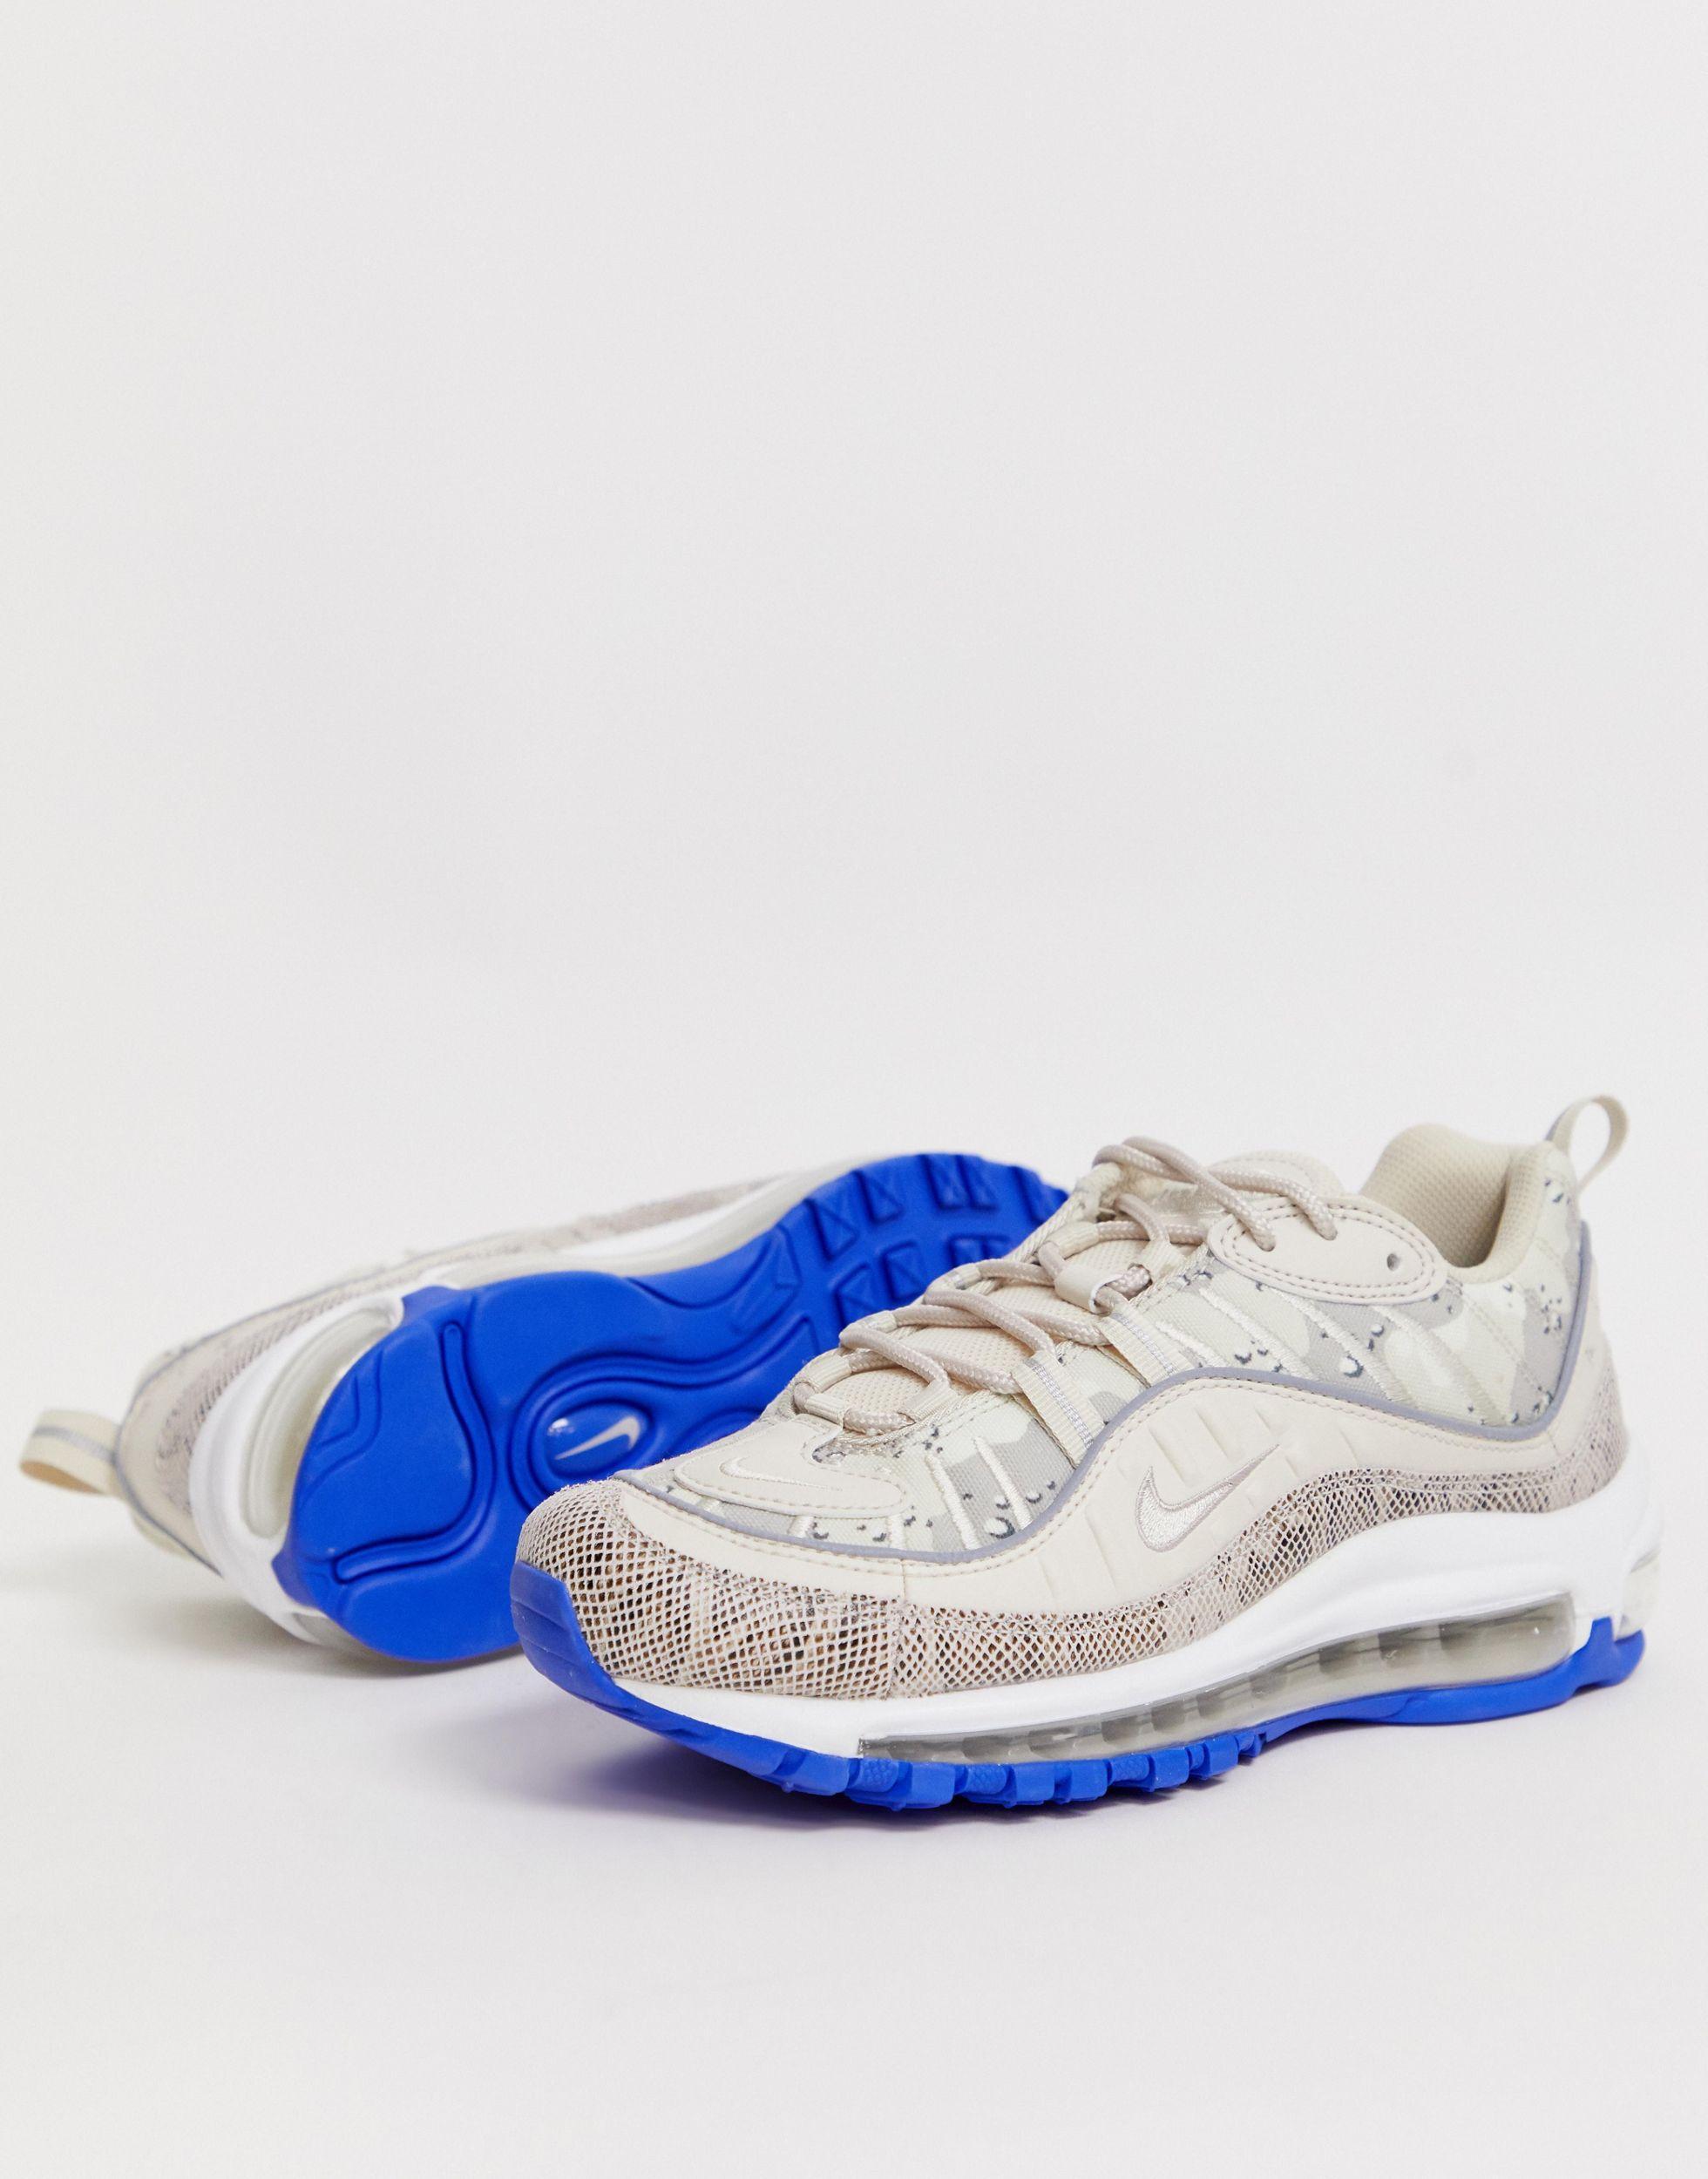 Nike Leather Air Max 98 Premium W